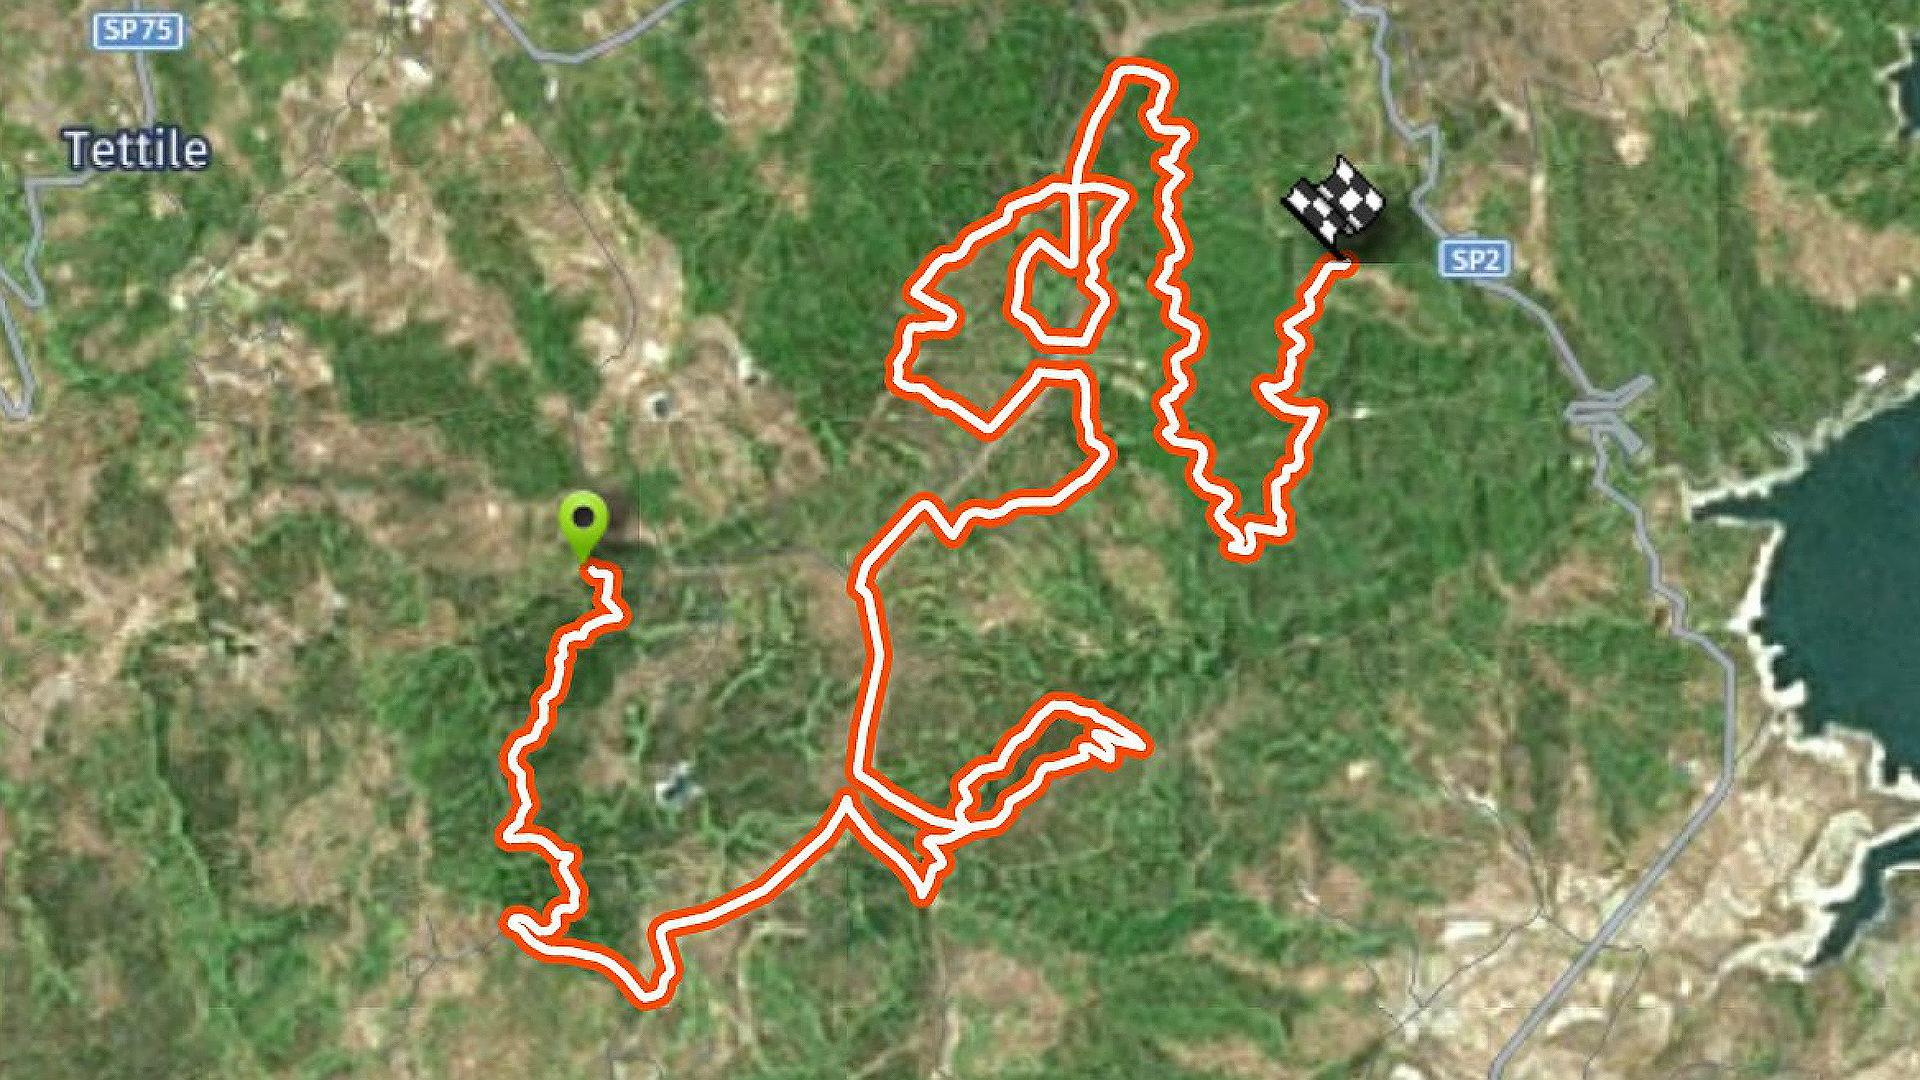 WRC: Rally d' Italia - Sardegna [8-10 Octubre] - Página 2 091020_WRC-SS2map-Italy_001